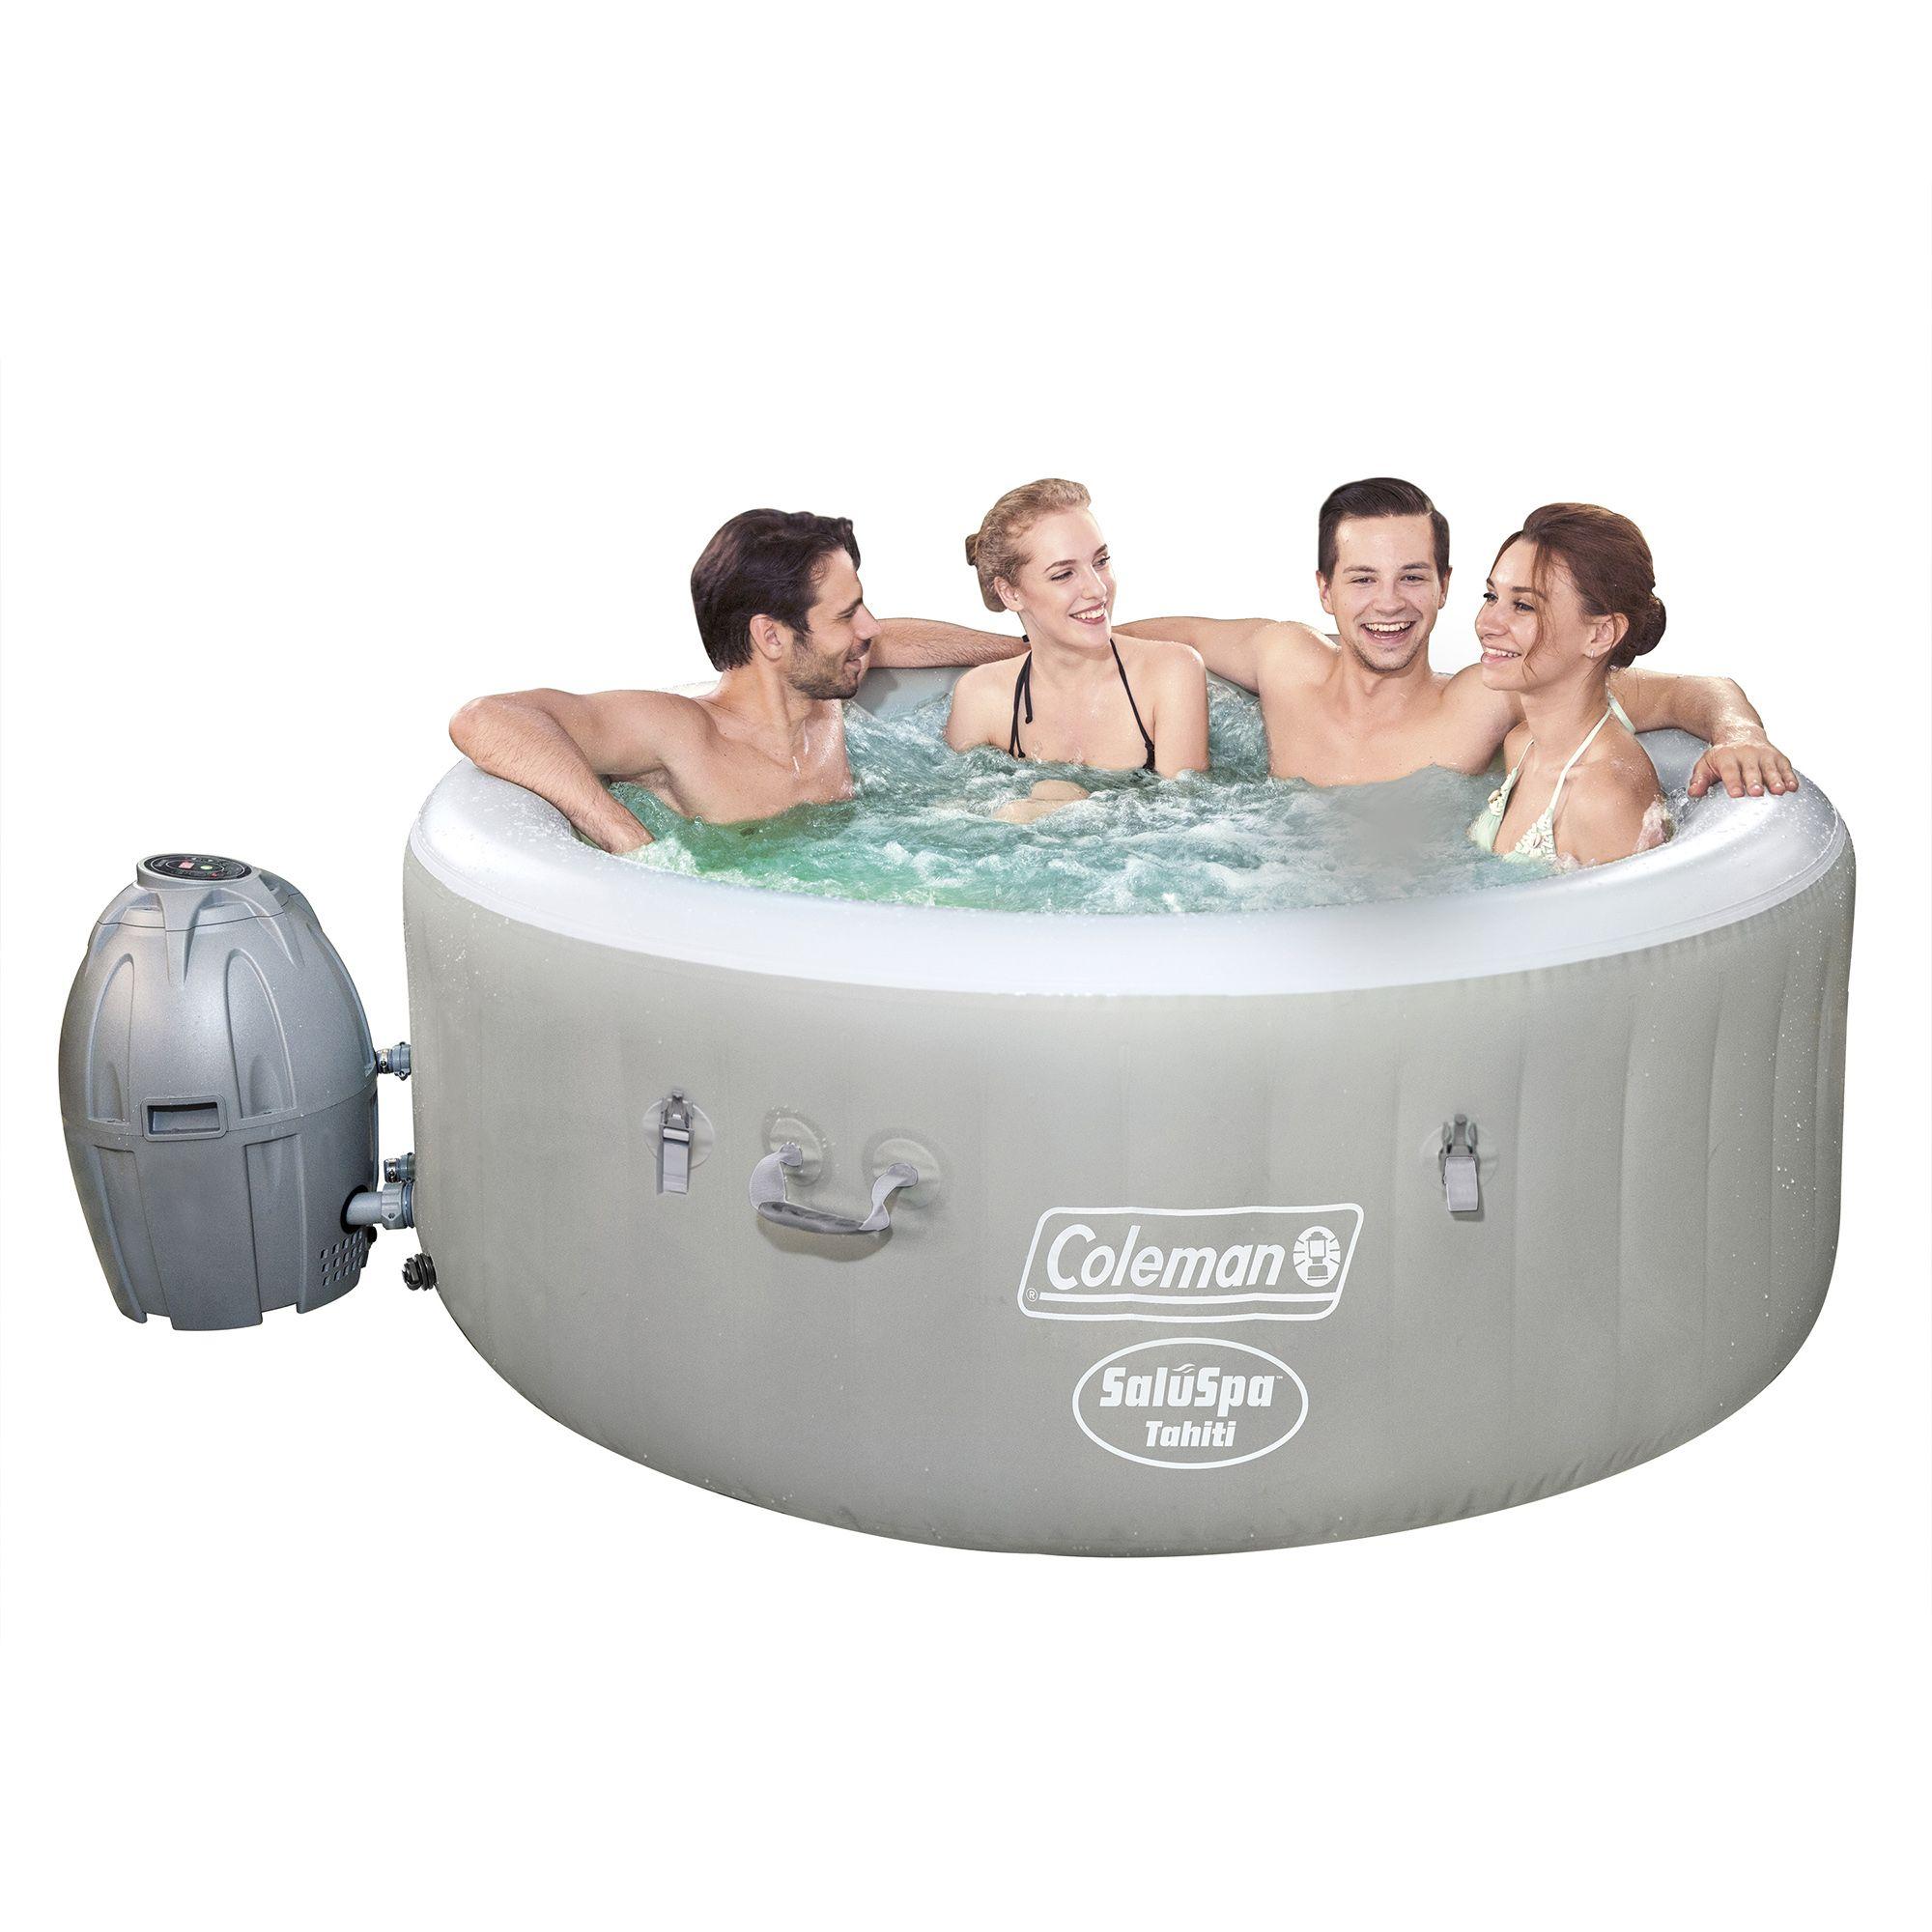 Coleman Saluspa 71 X 26 Tahiti Airjet Inflatable Hot Tub 2 4 Person Walmart Com In 2021 Inflatable Hot Tubs Hot Tub Spa Hot Tubs